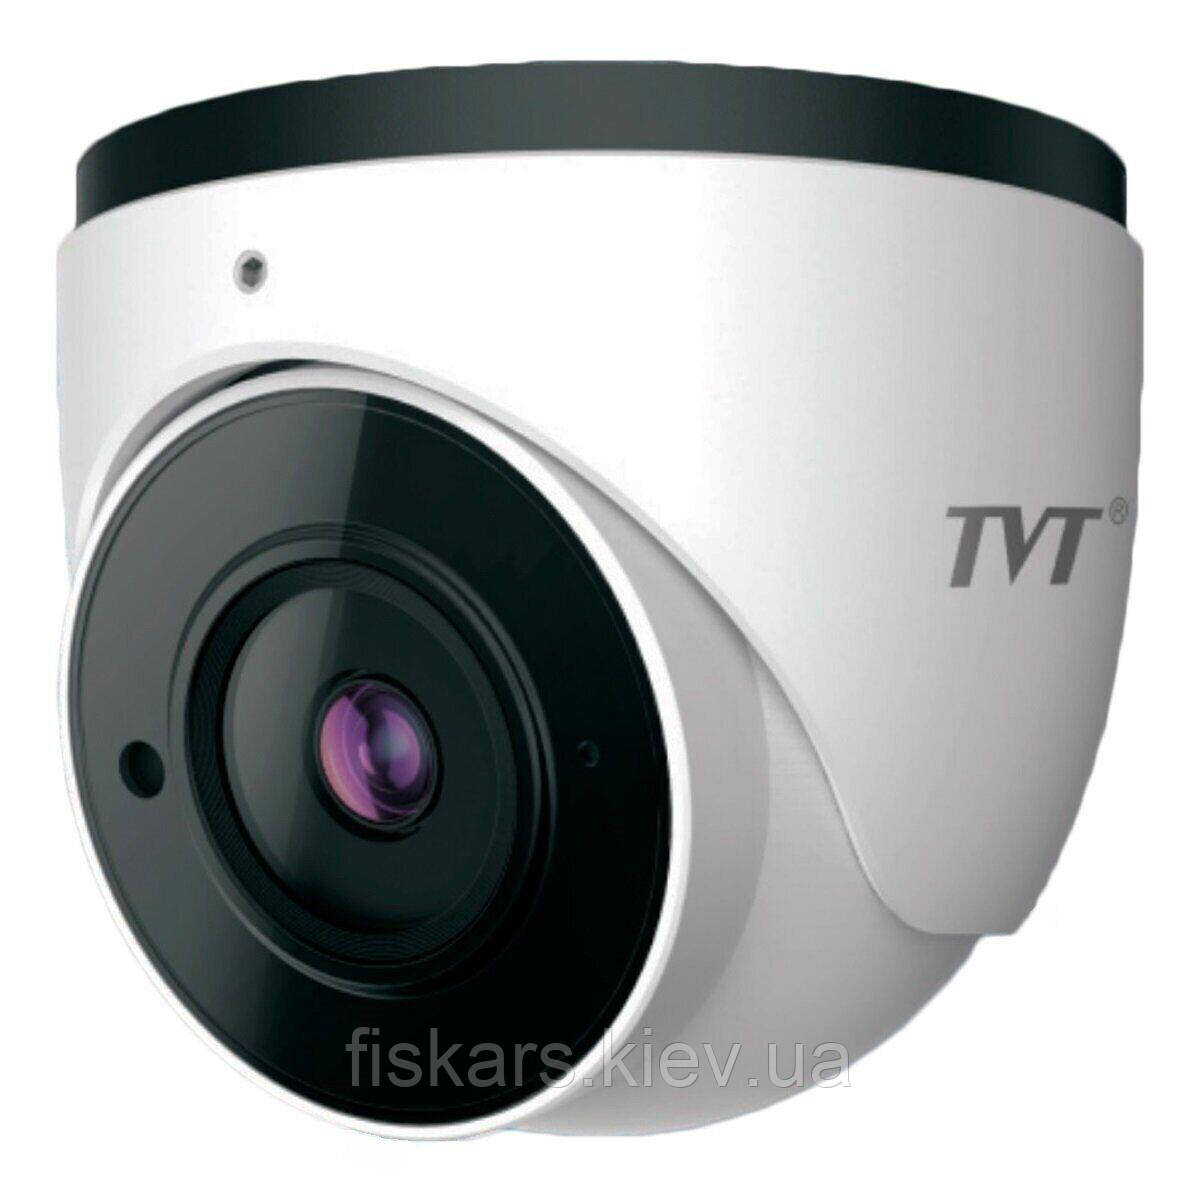 2 Мп IP-камера с видеоаналитикой TVT Digital TD-9524E3 (D/PE/AR2)